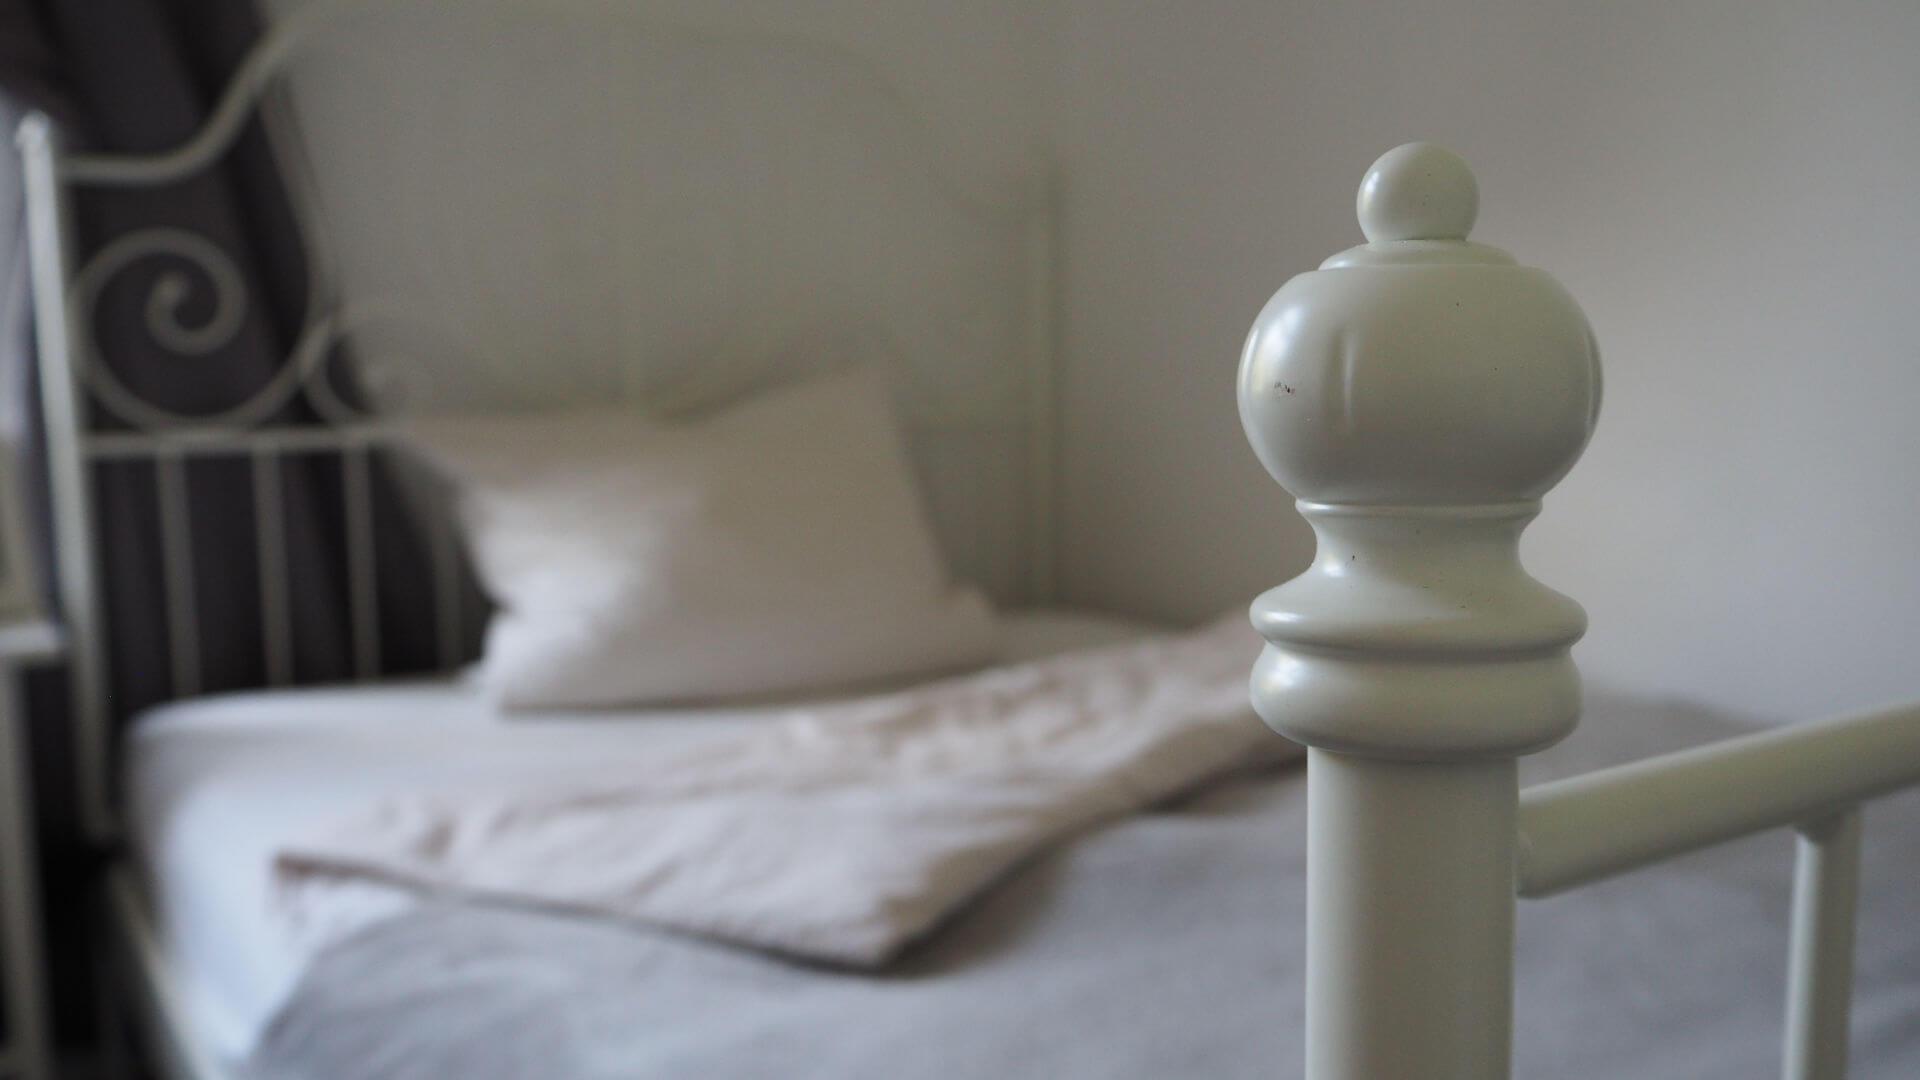 Kopfkissen im Bett